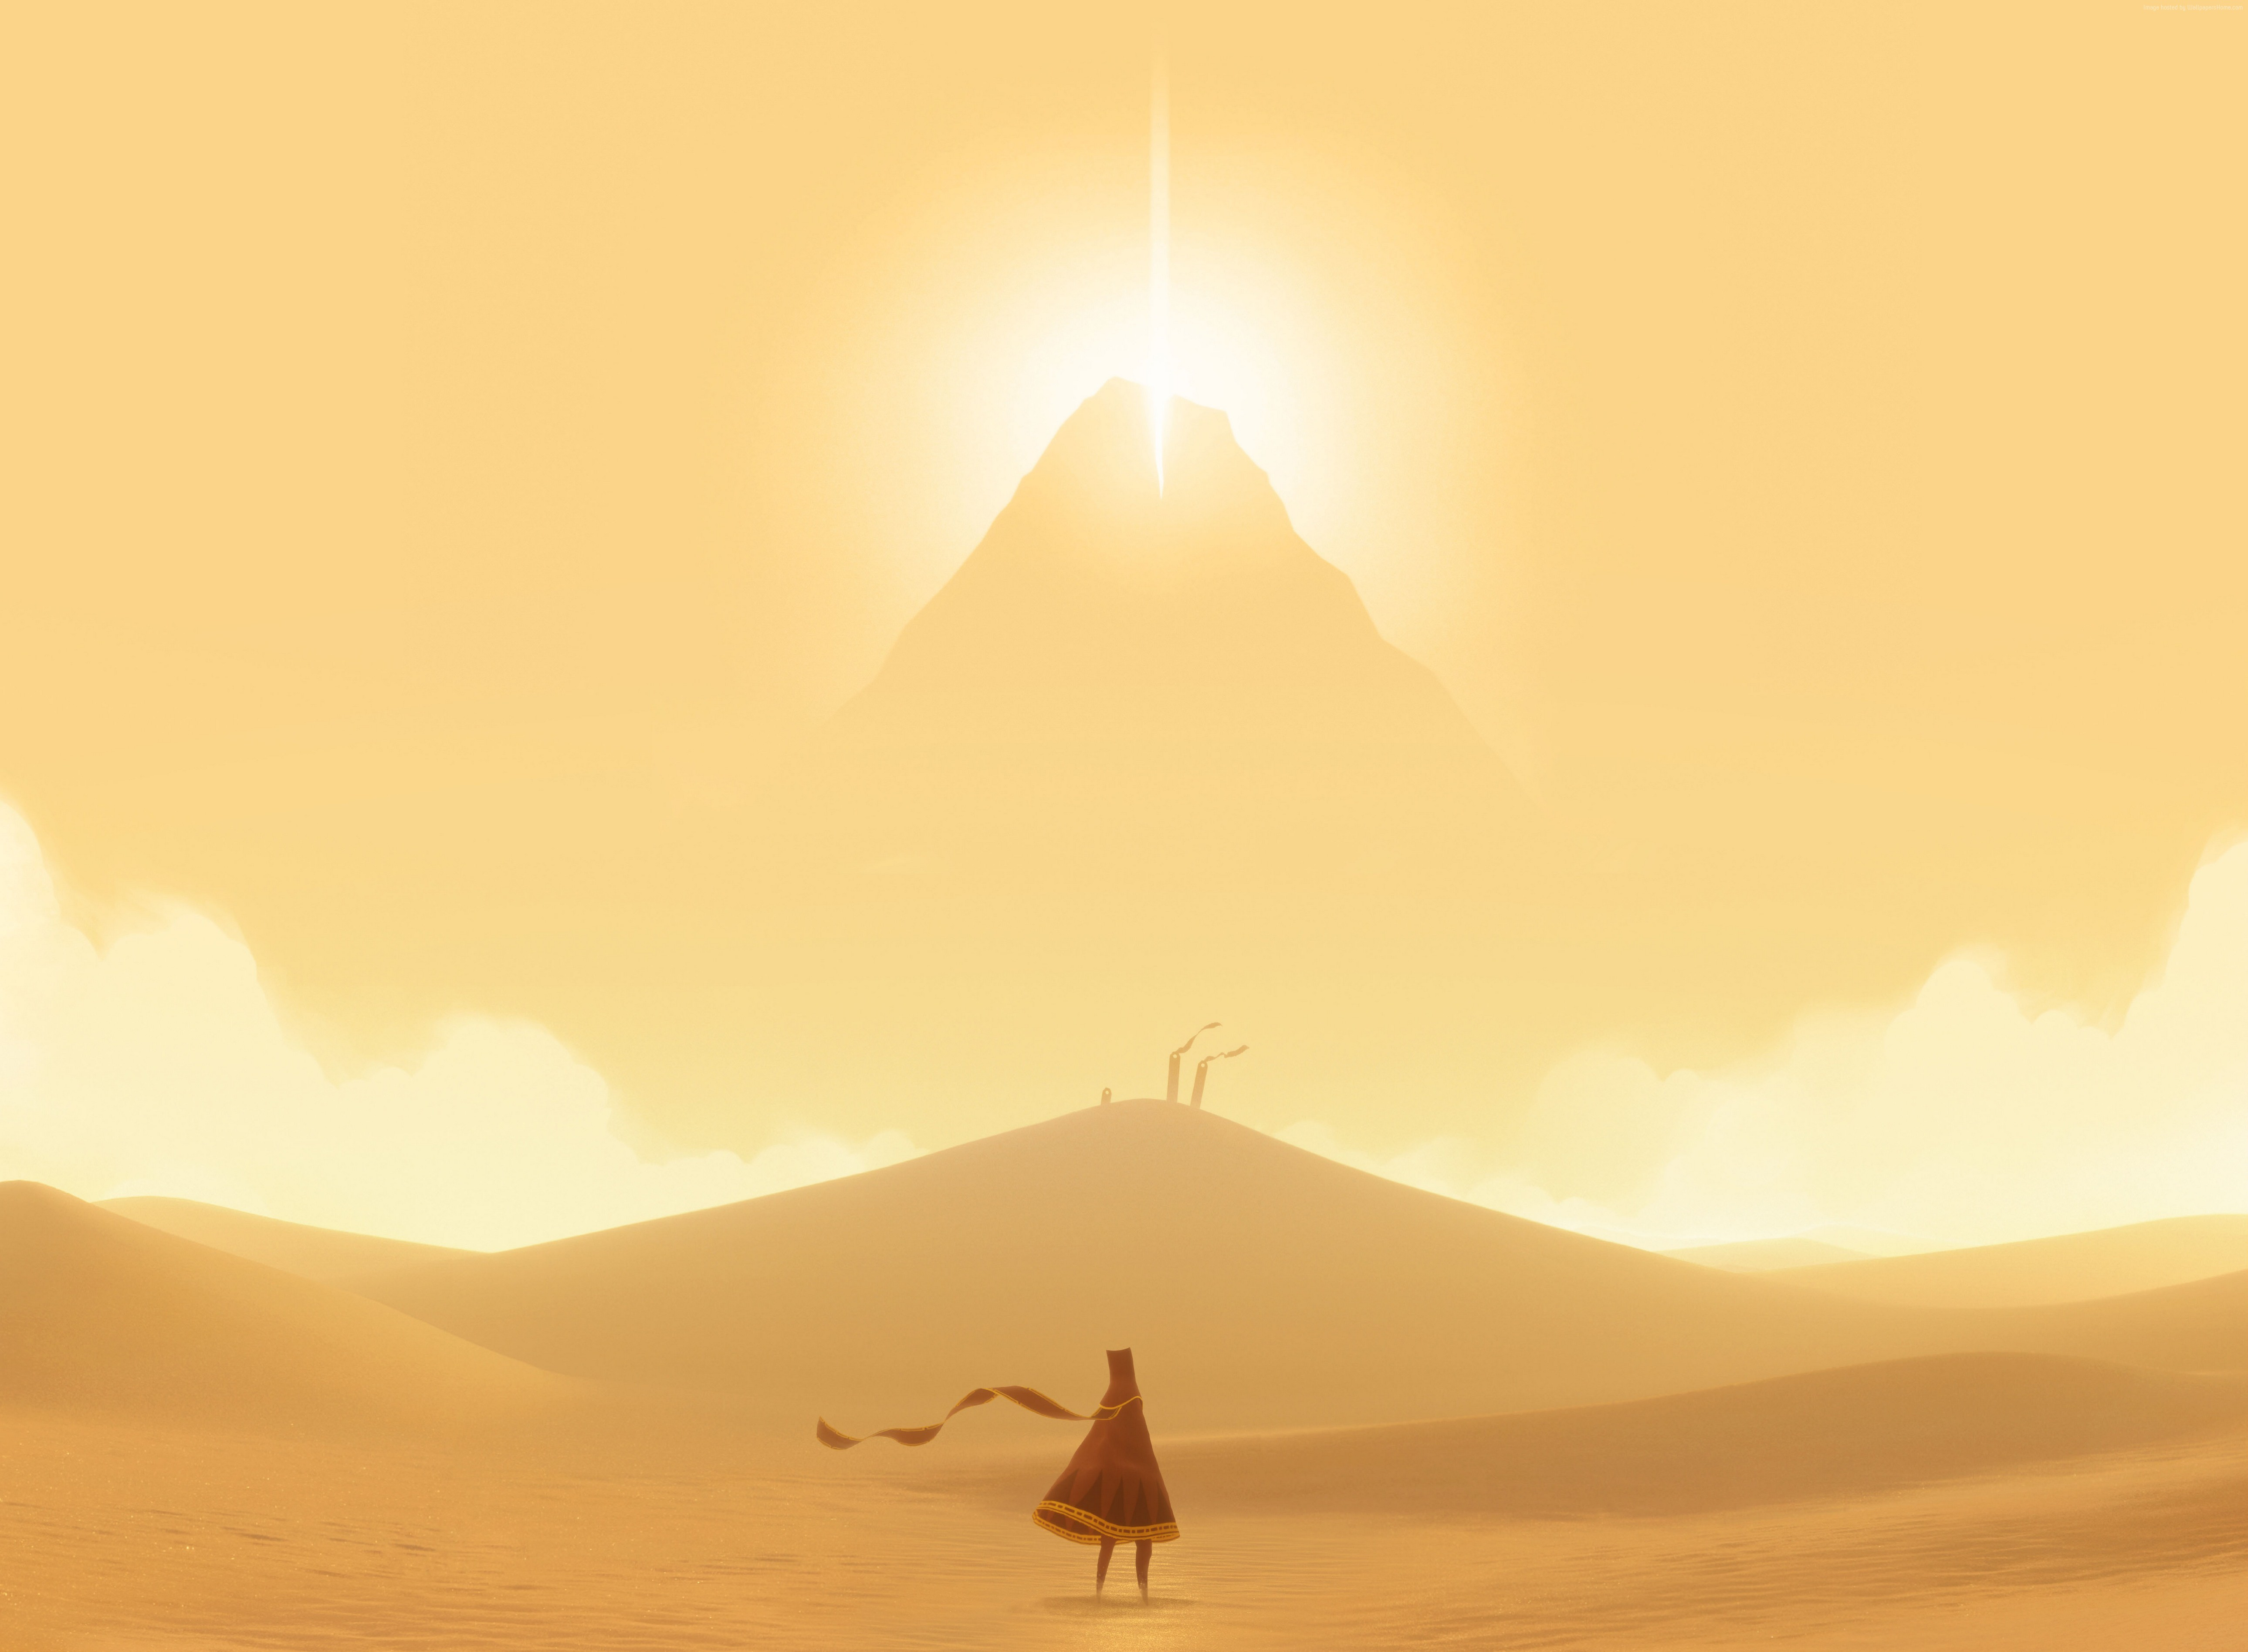 journey game art wallpaper - photo #34